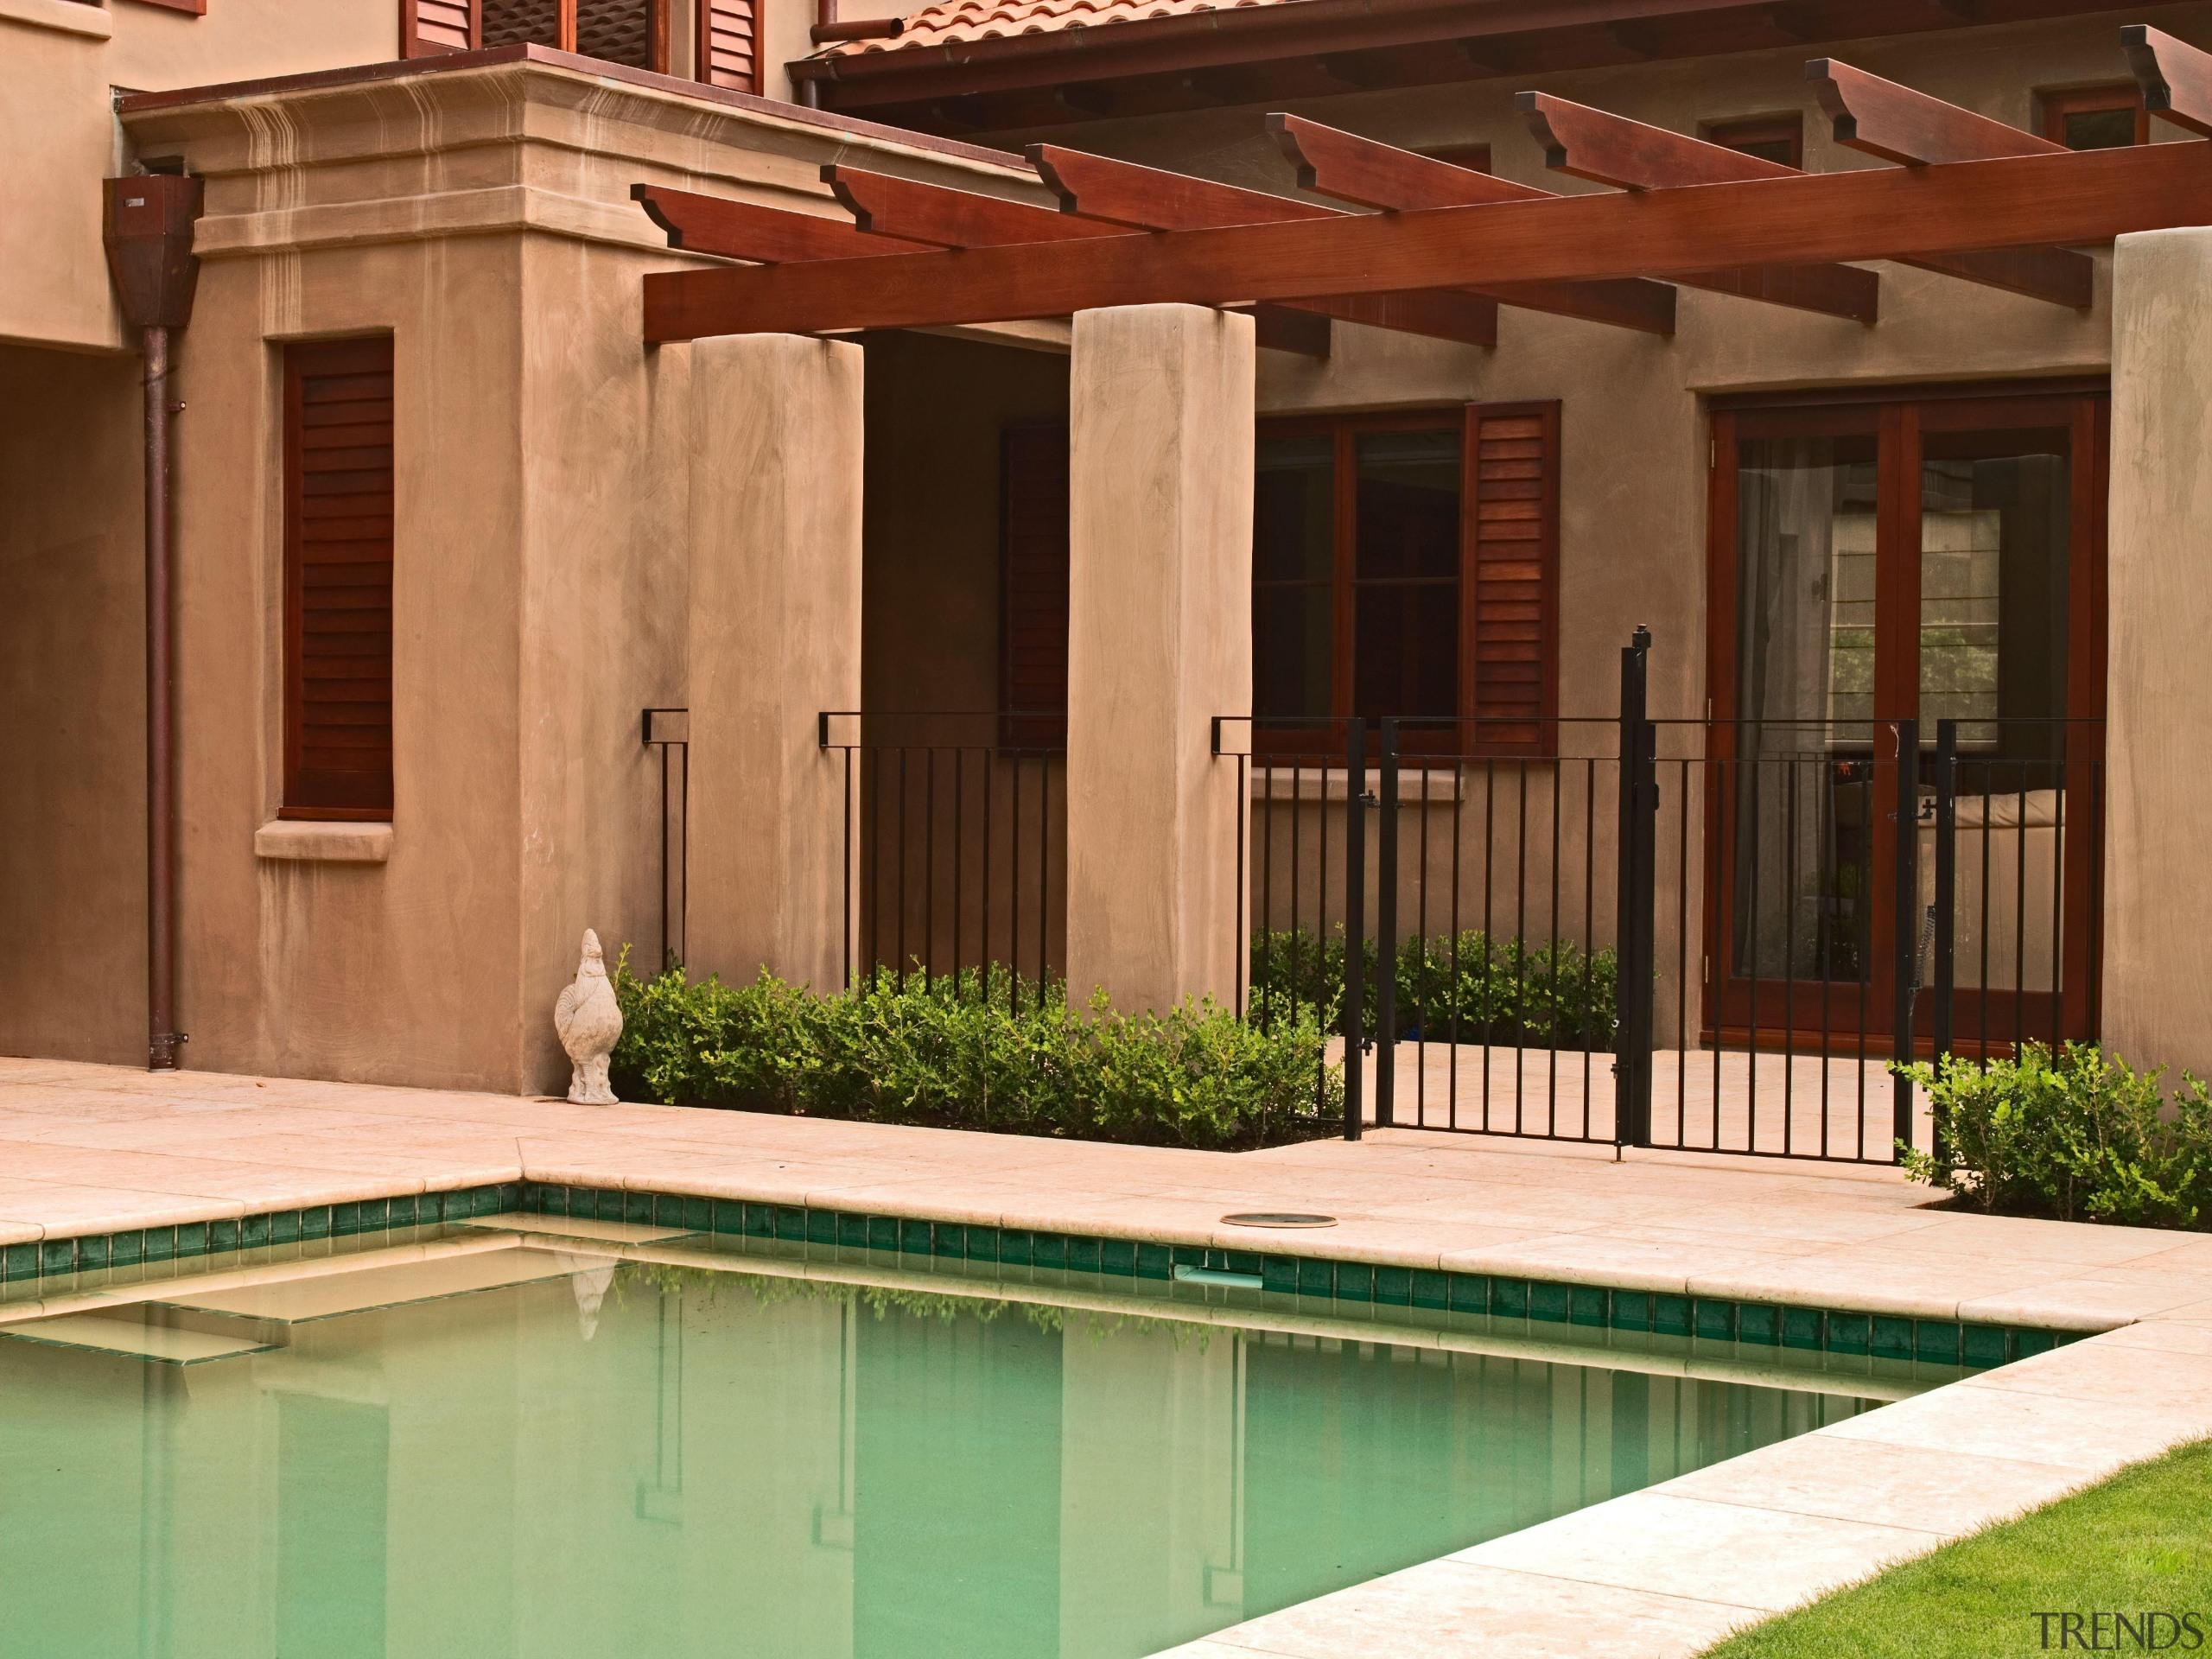 139 onetaunga pergola - Onetaunga Pergola - backyard backyard, estate, facade, house, outdoor structure, property, real estate, residential area, window, wood, brown, orange